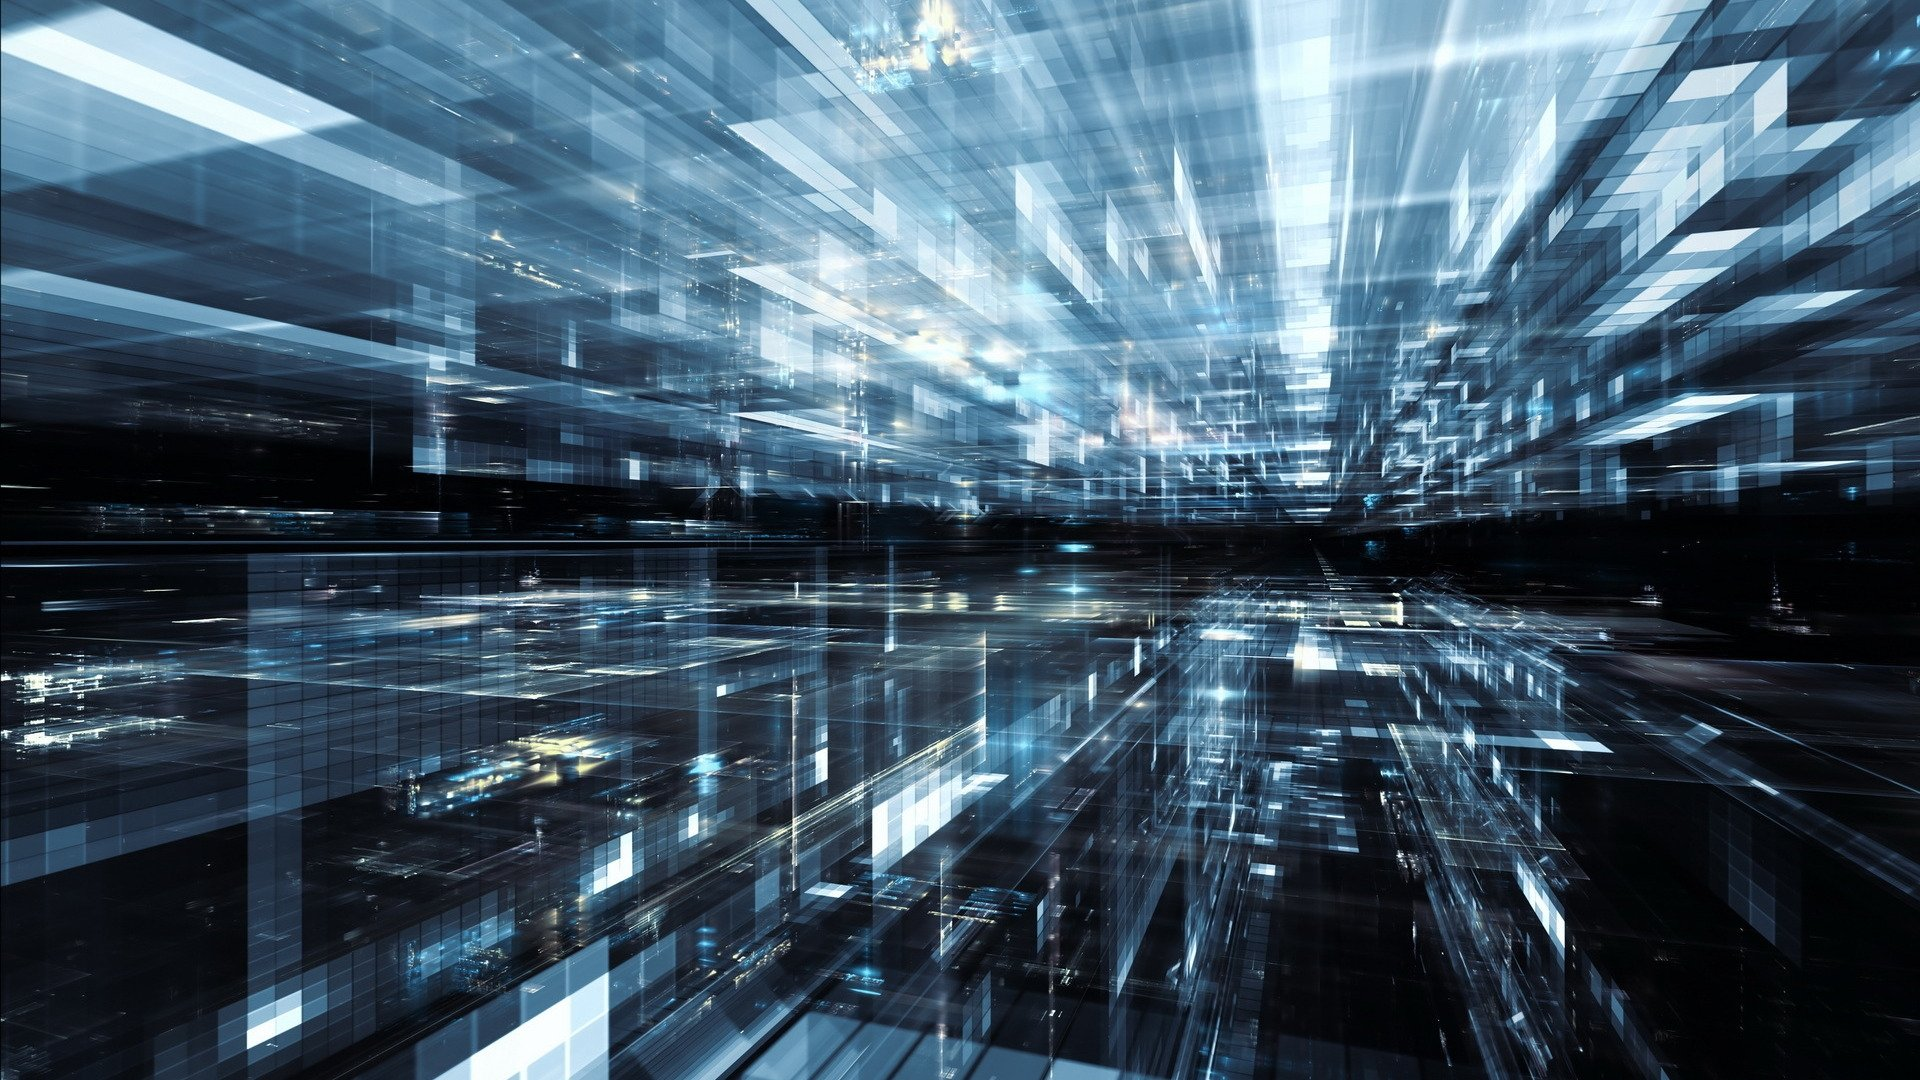 Cyber Wallpaper Image